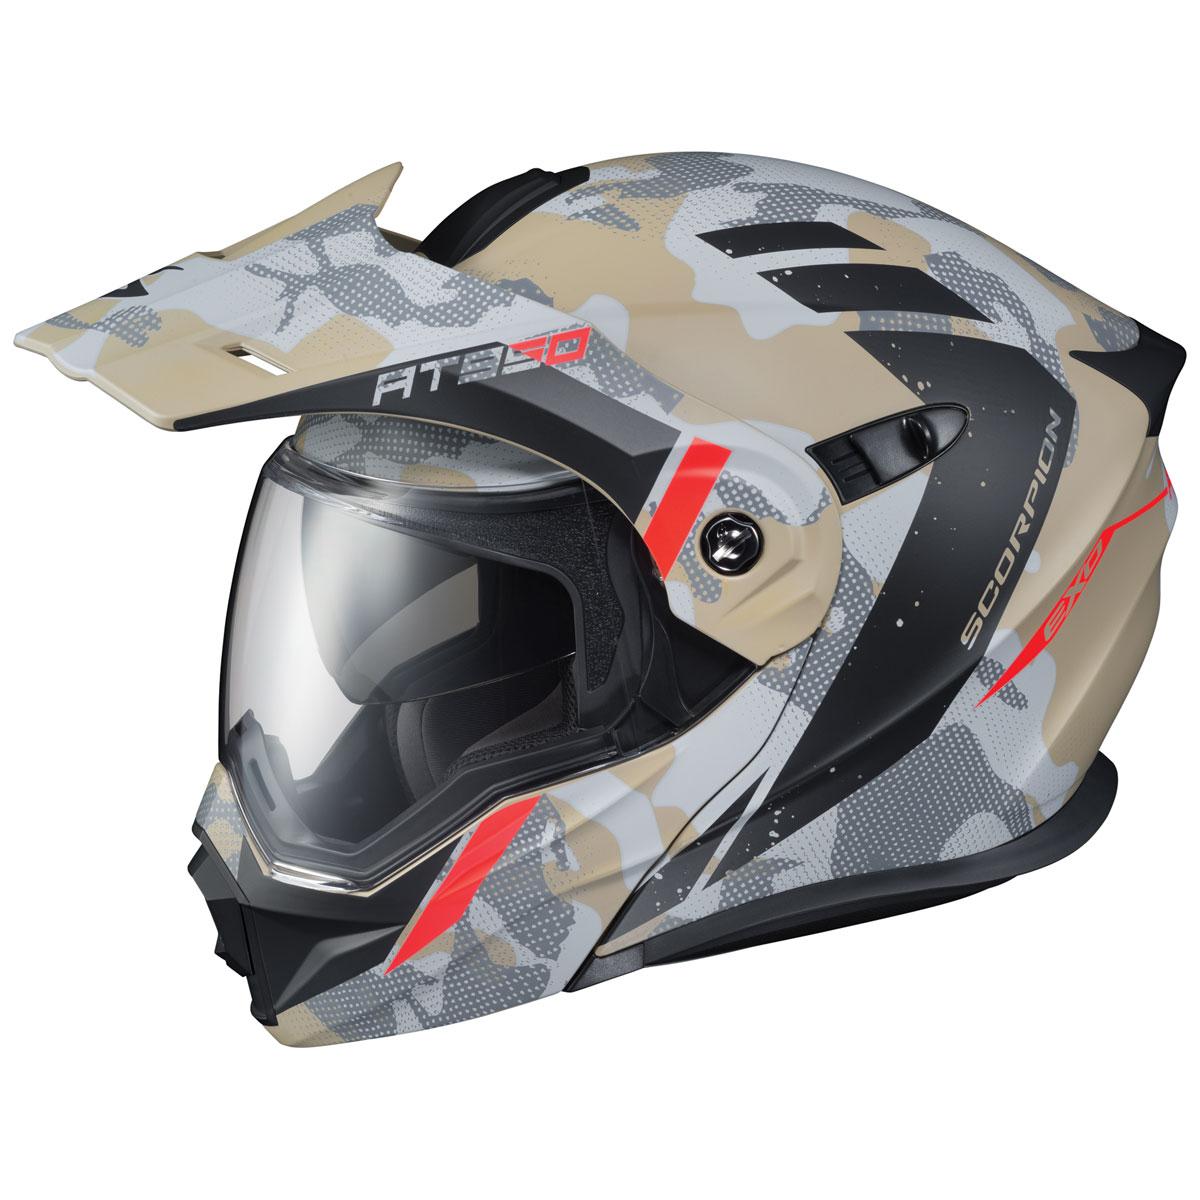 Scorpion EXO EXO-AT950 Outrigger Sand Modular Helmet